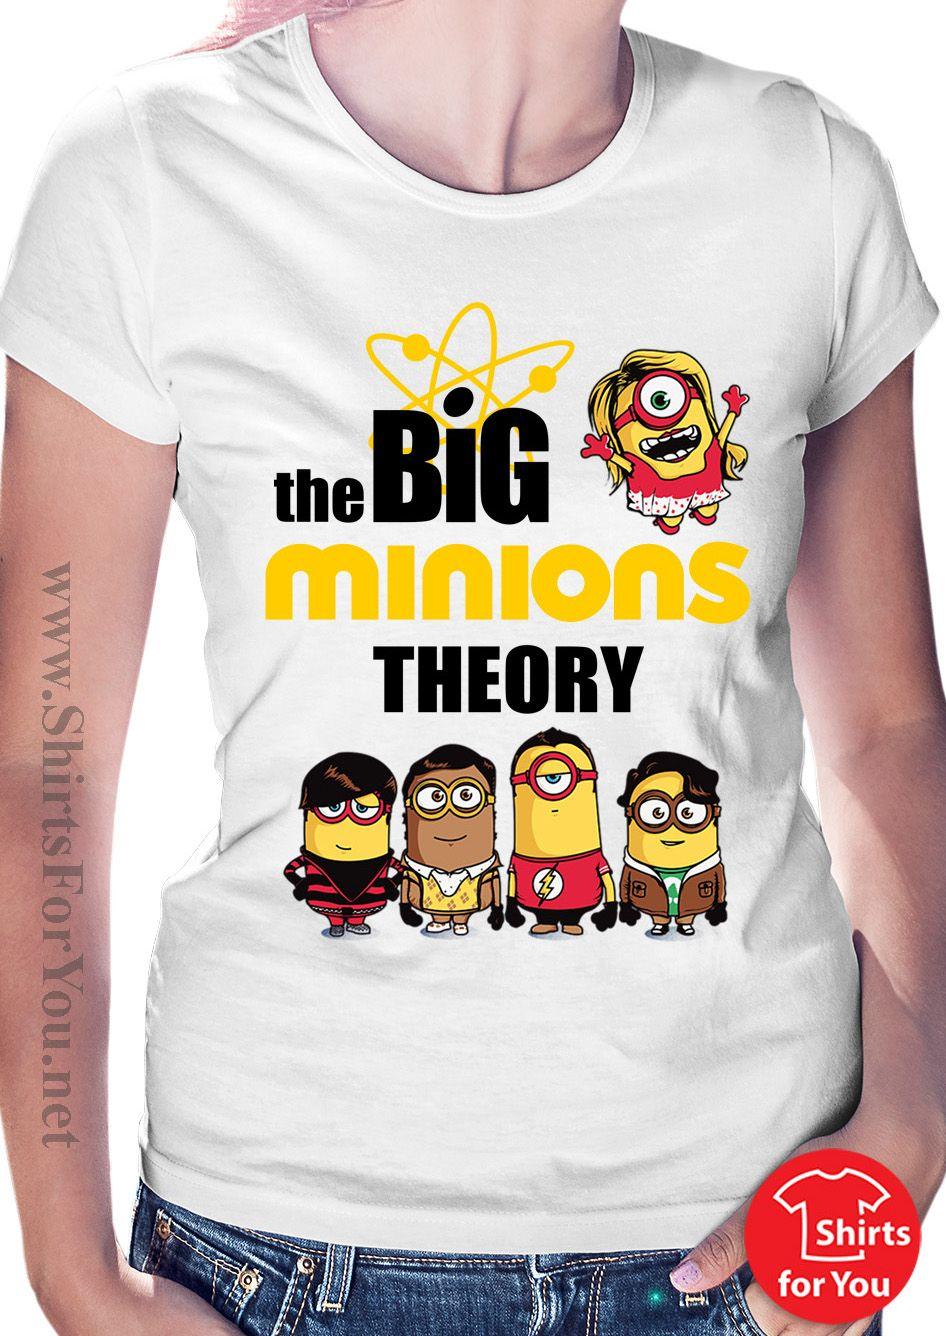 The Big Minions Theory Womens T Shirt Minions T Shirts Pinterest